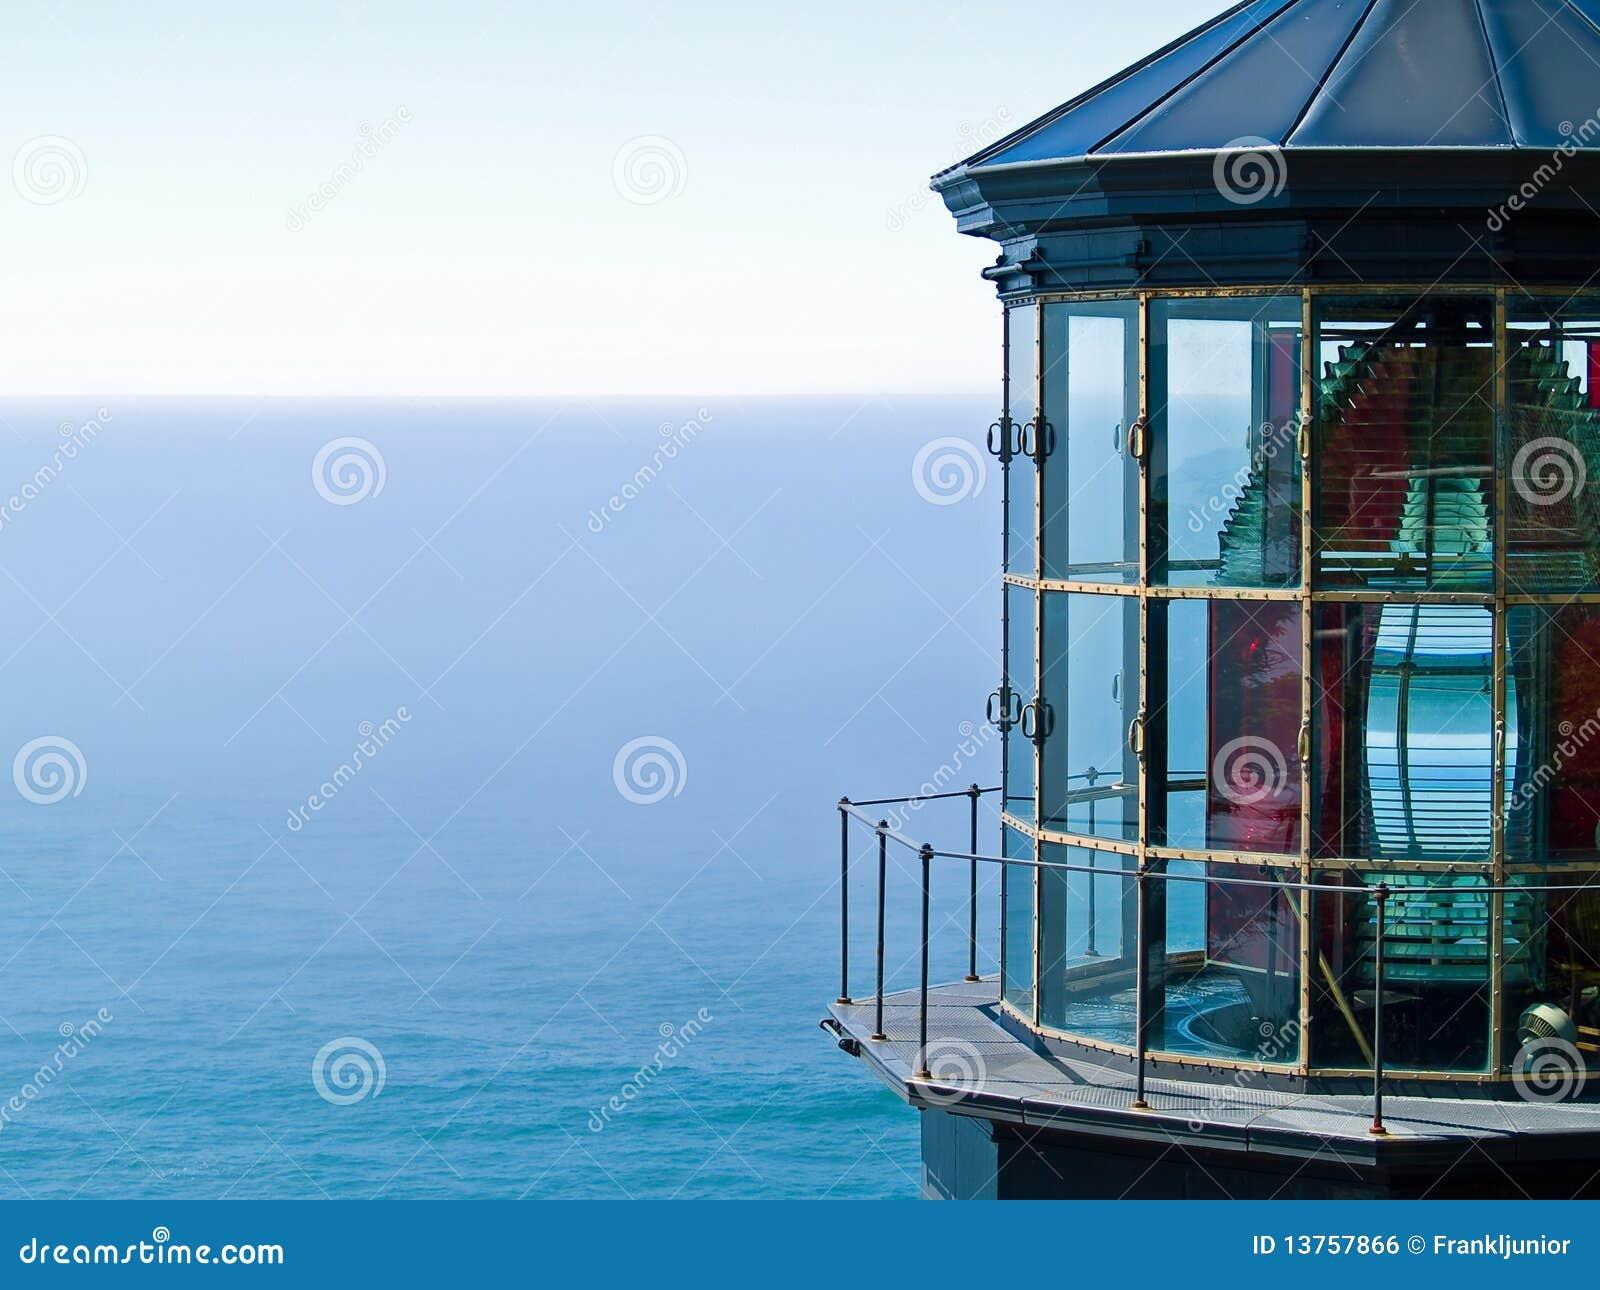 Cape Meares Lighthouse on the Oregon Coast